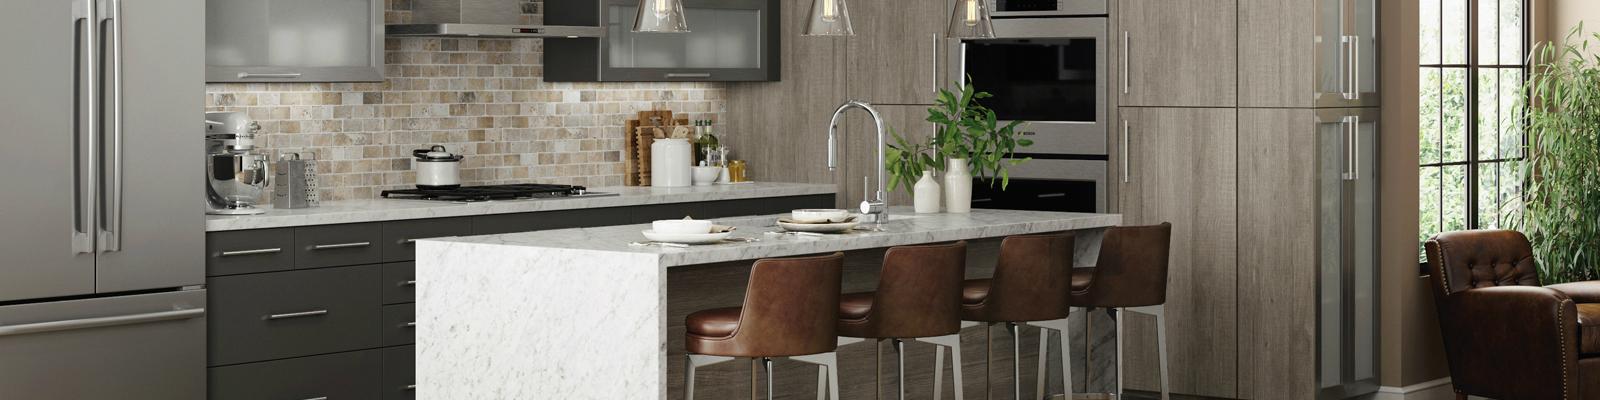 Latitude Kitchen Cabinets